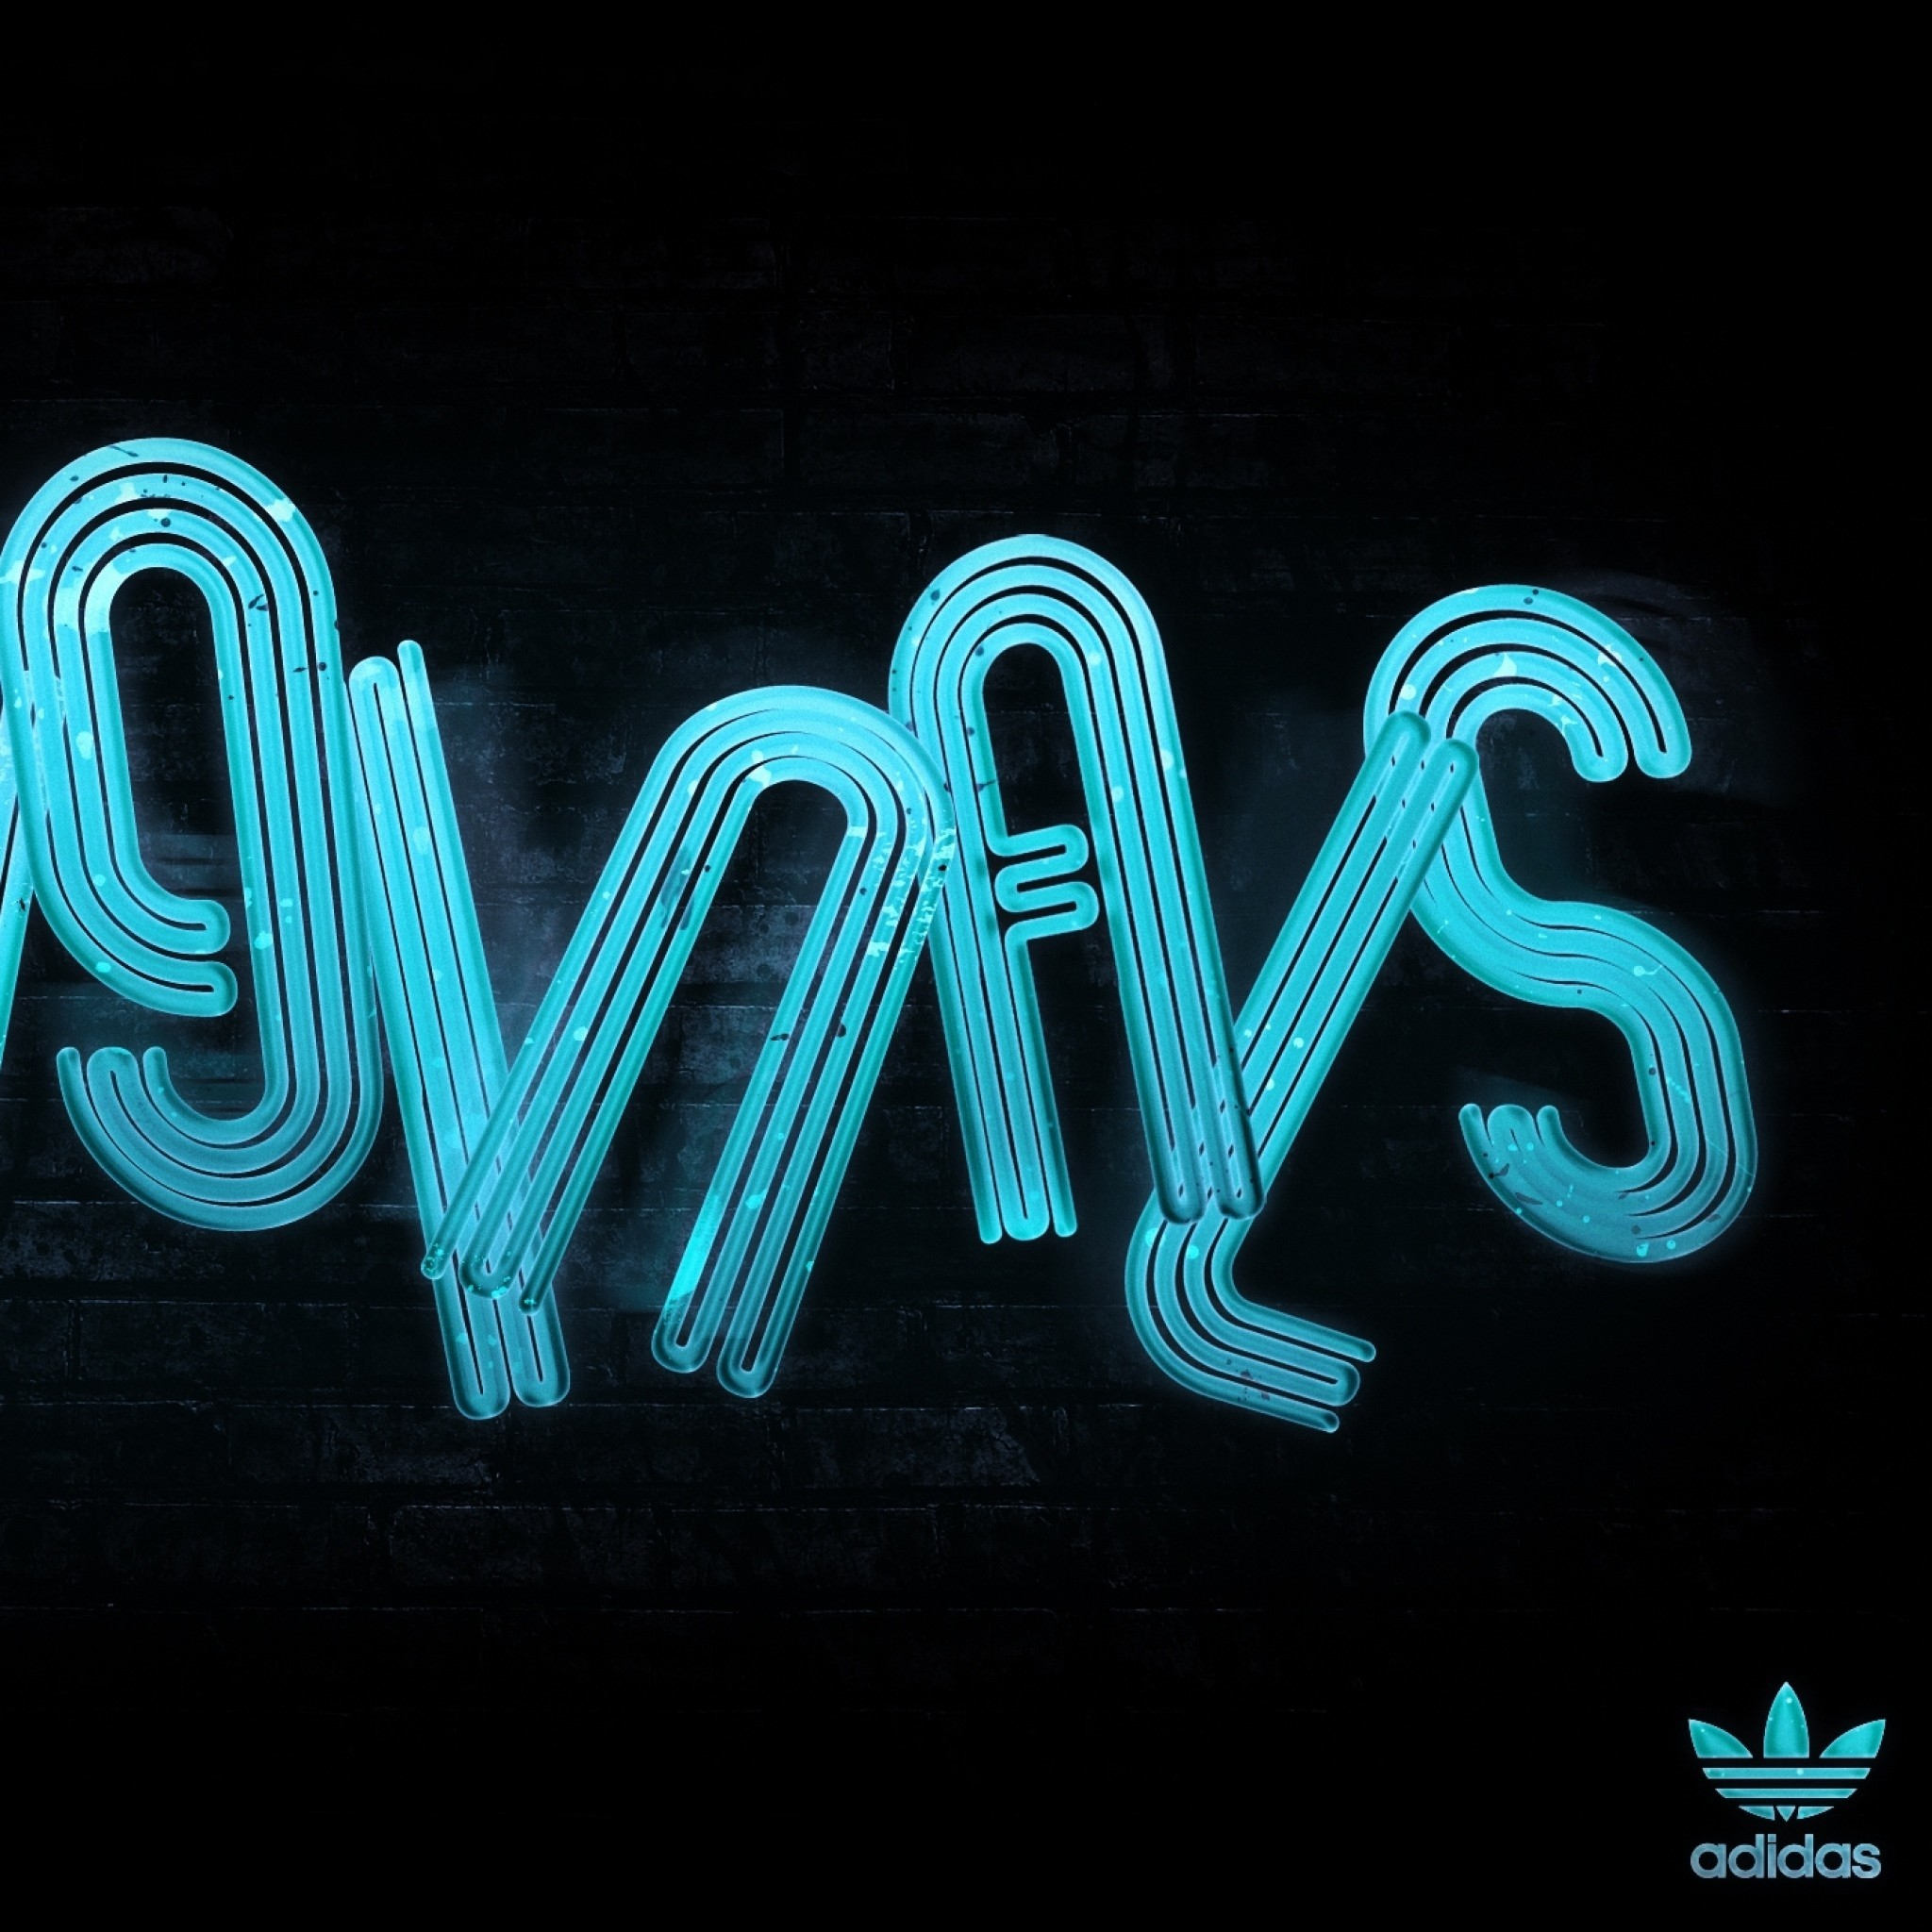 Preview Wallpaper Adidas, Original, Blue, Neon, Logo - Adidas Phone Case Iphone 7 Plus - HD Wallpaper